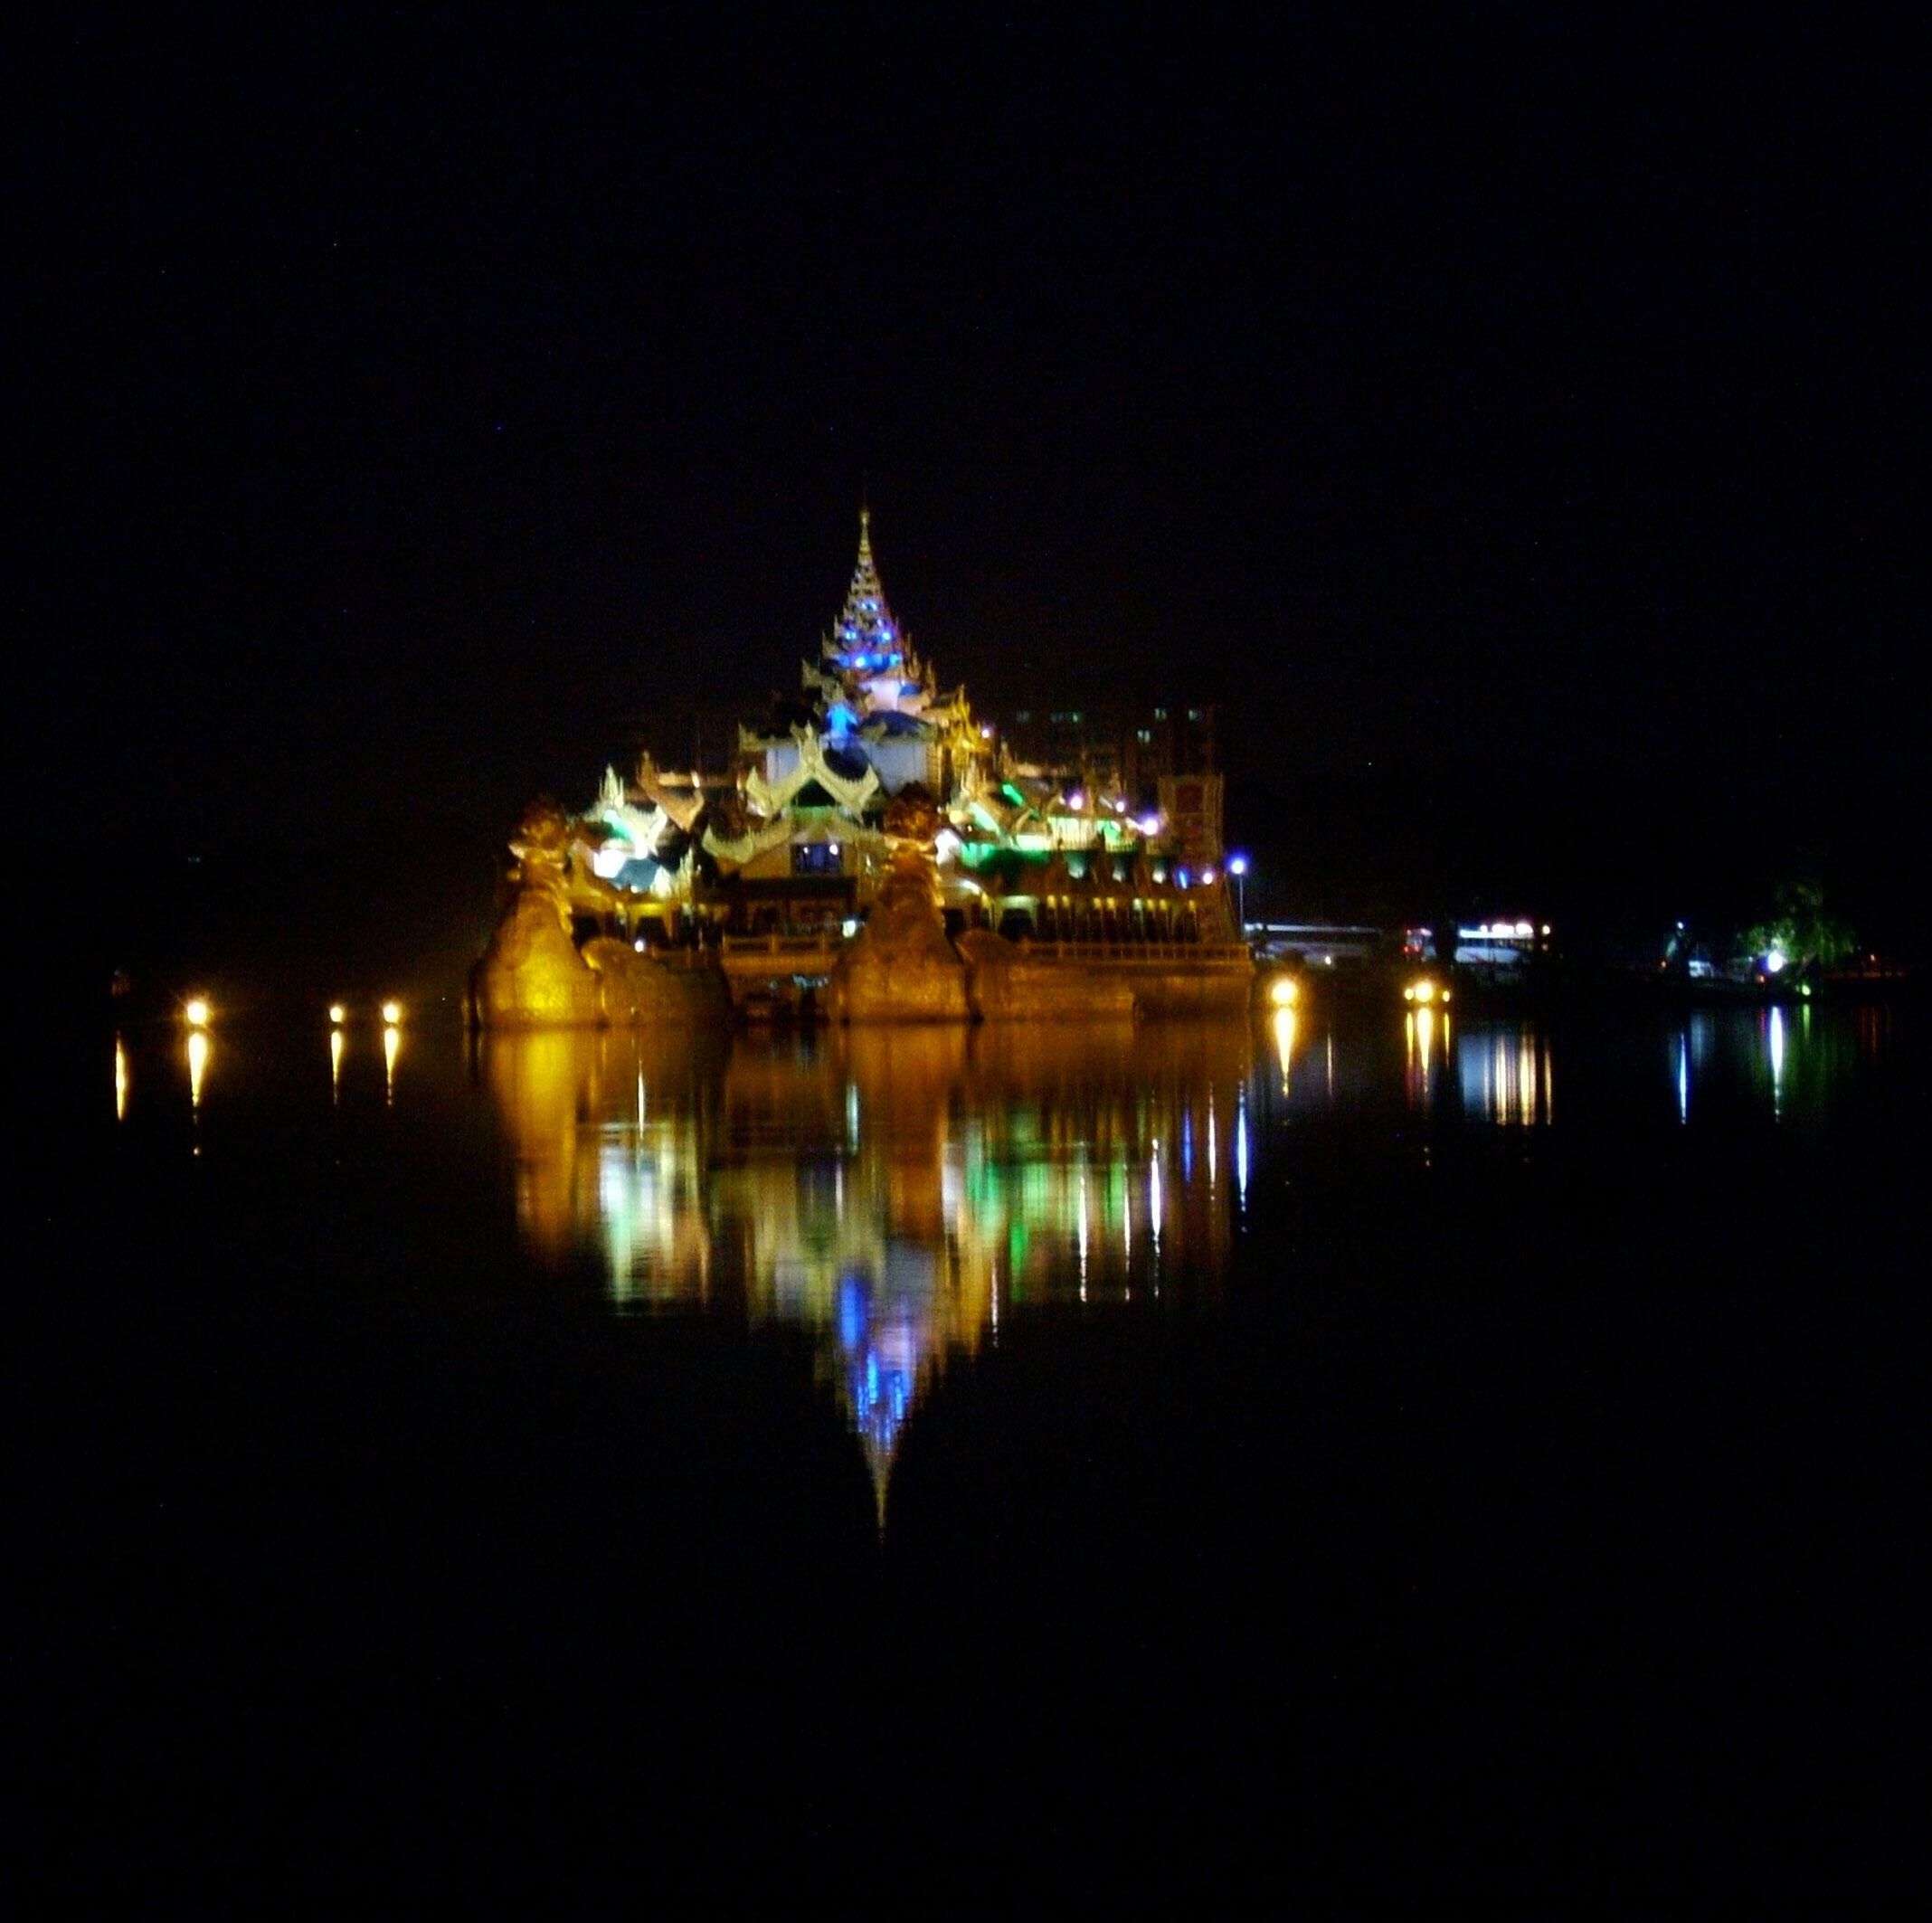 Myanmar Yangon Kandawgyi Palace Hotel royal barge Nov 2004 15